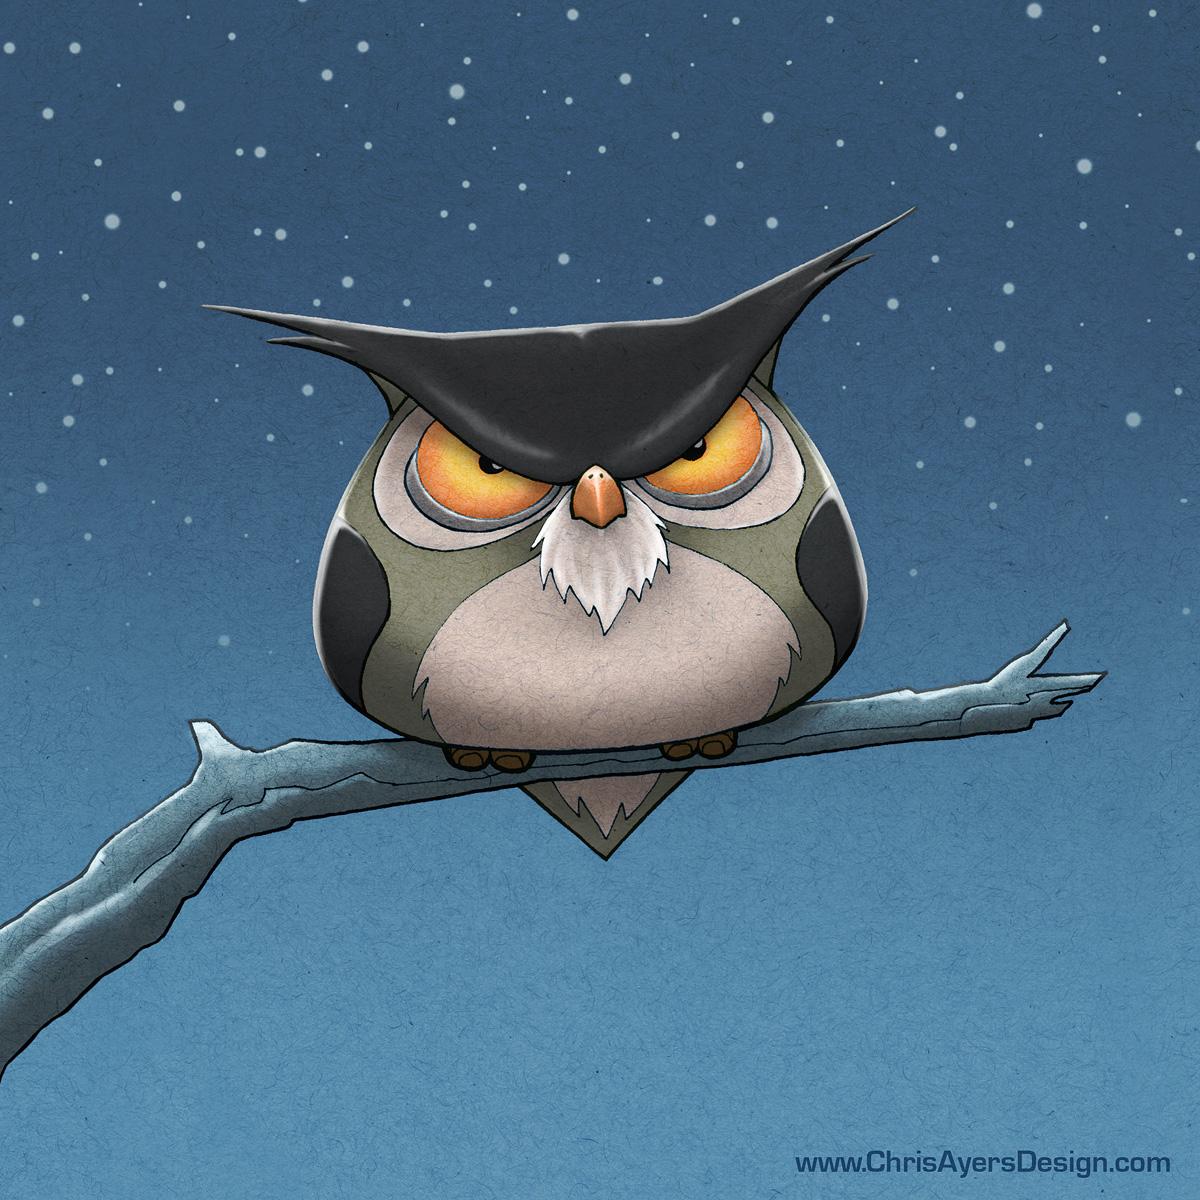 Day 233 - Owl